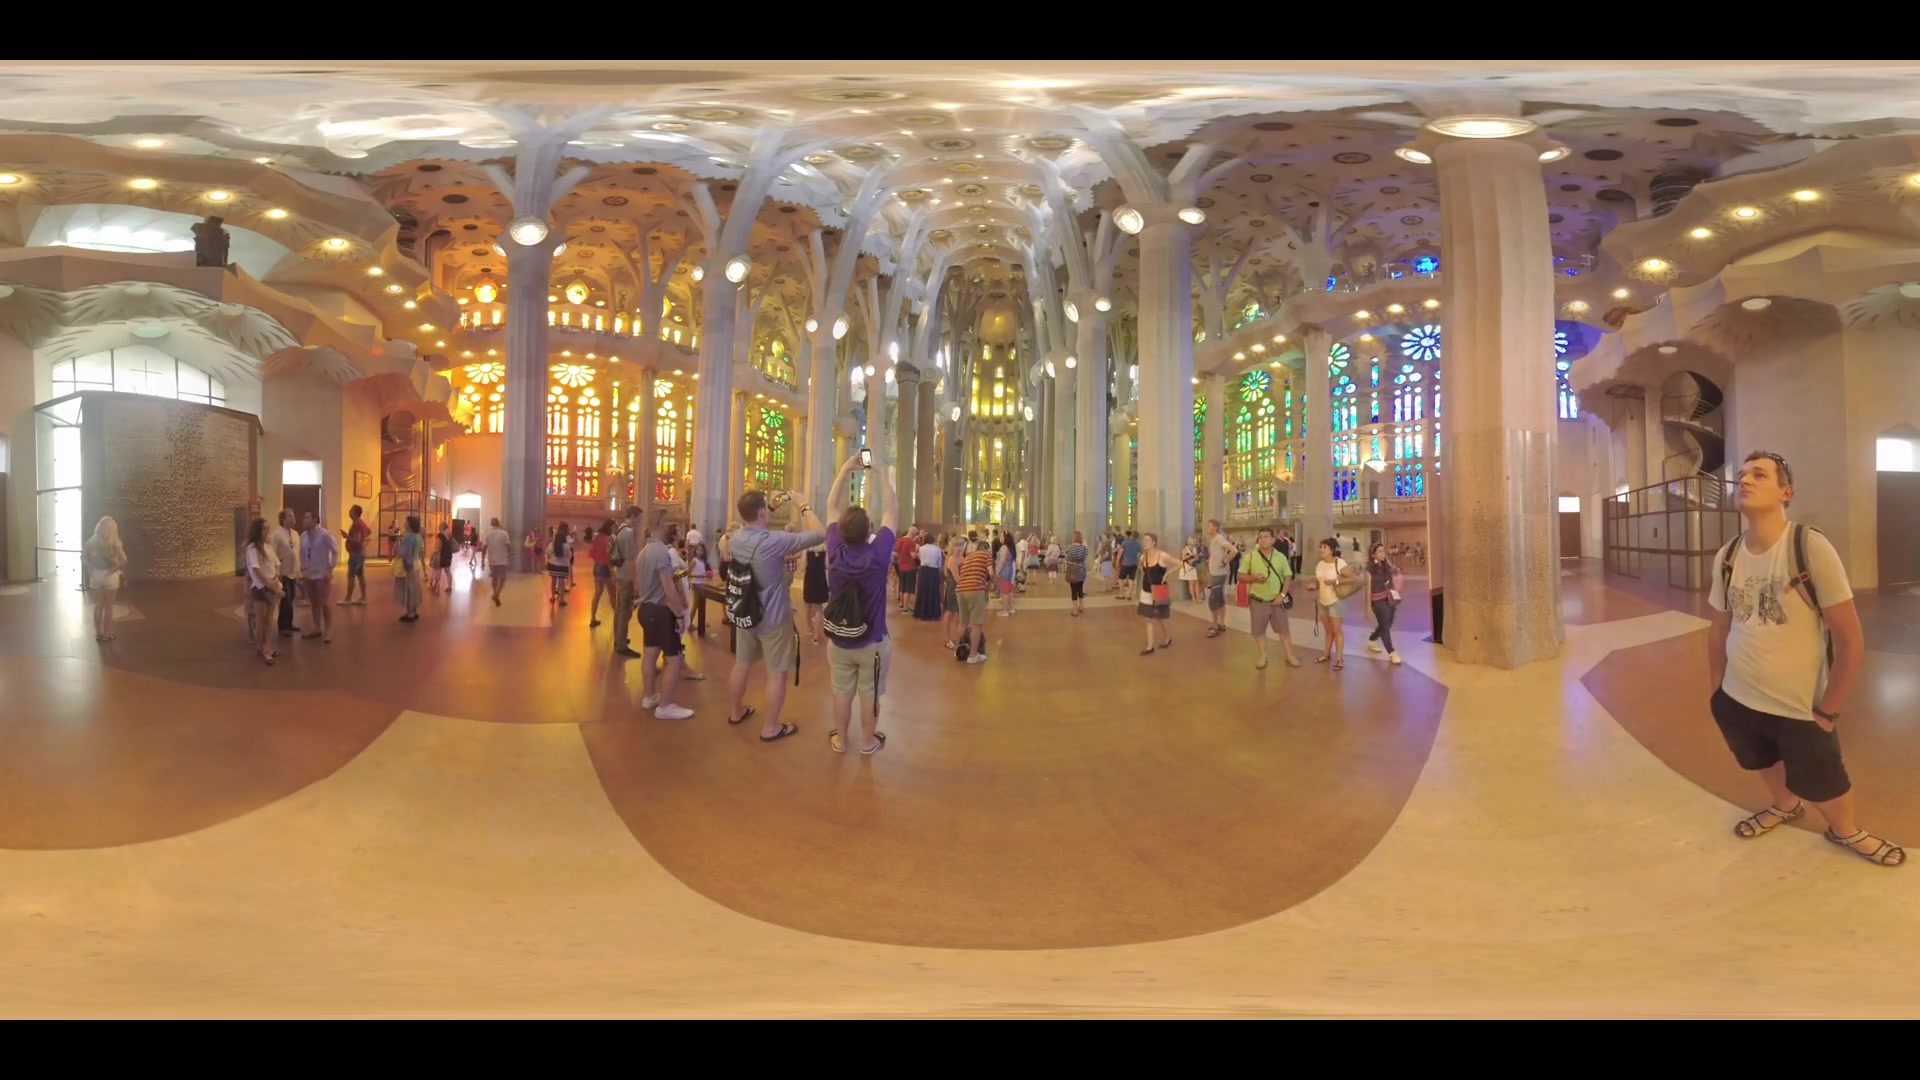 360 VR Visitors enjoying unique architecture inside Sagrada Familia, Barcelona